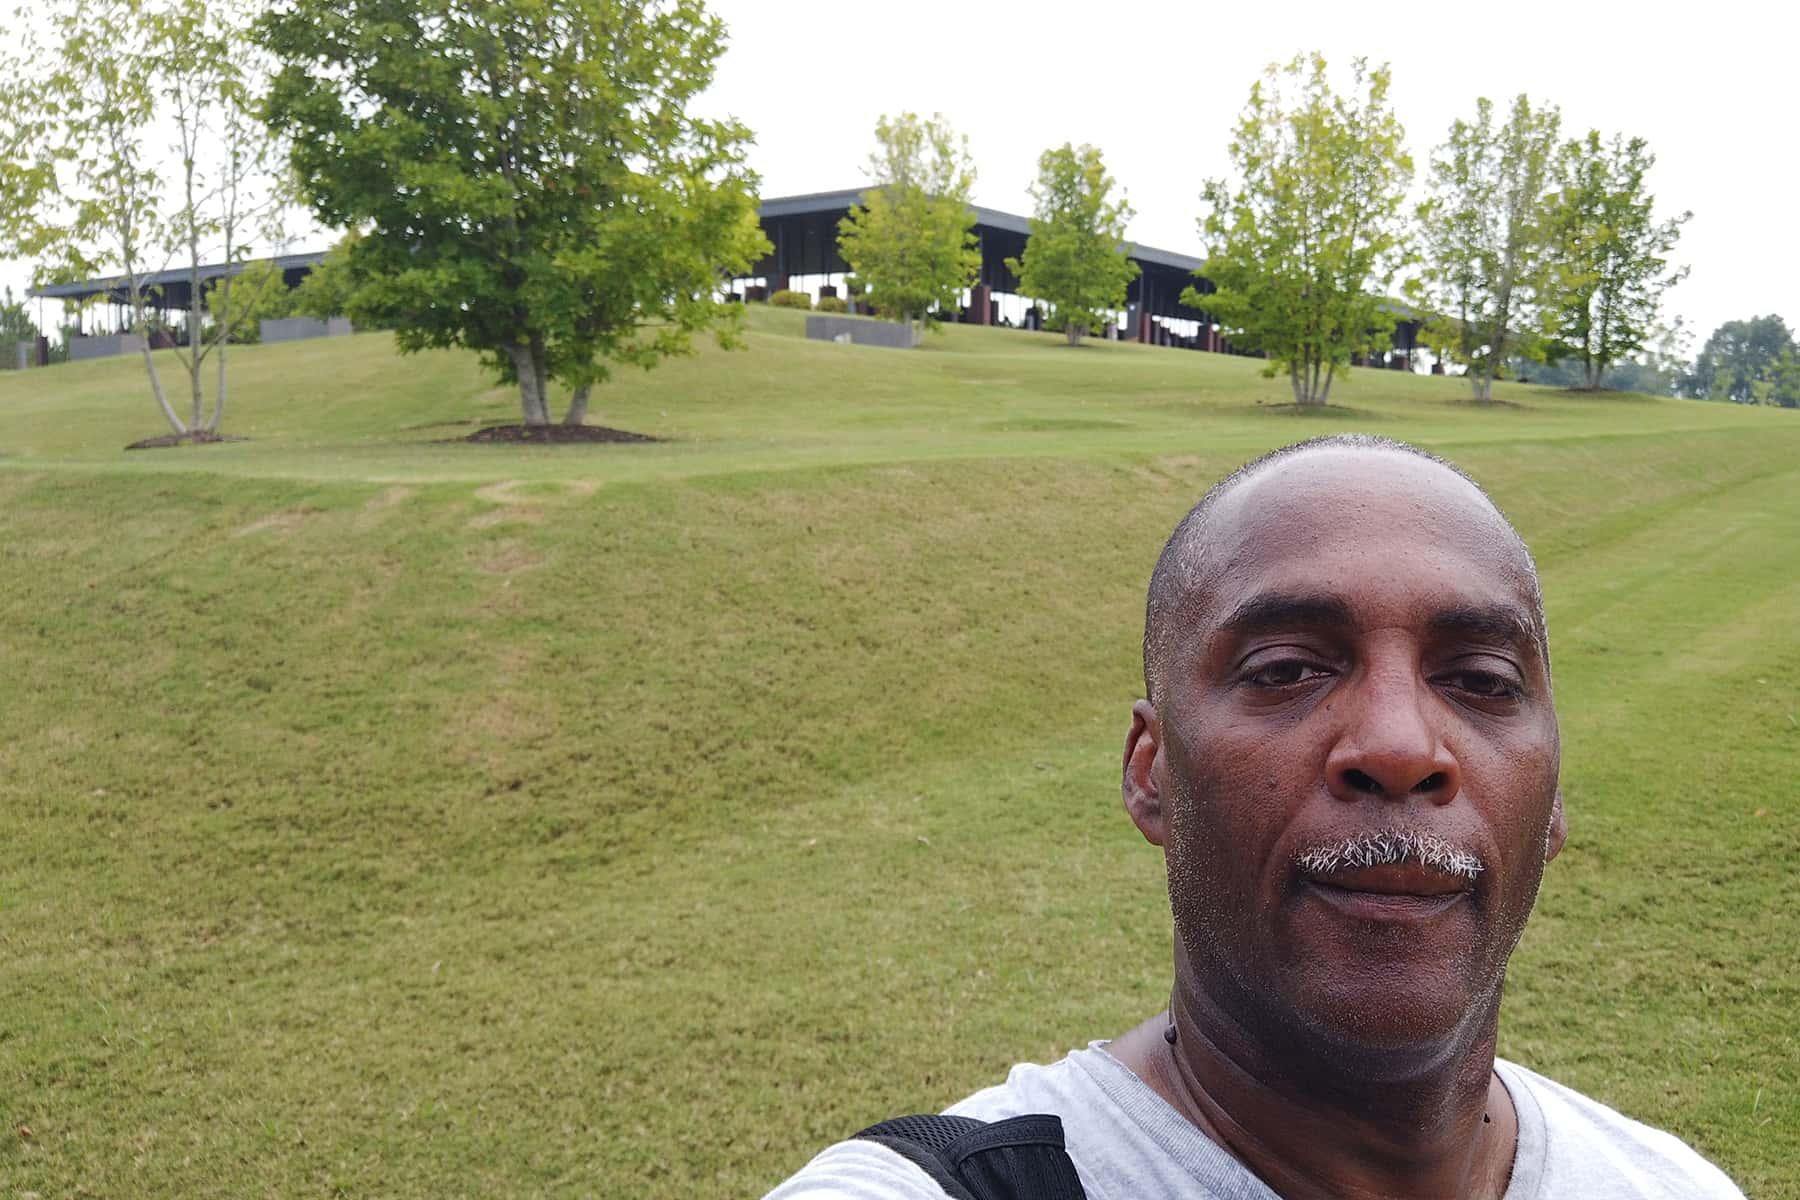 080421_Alabama_34_MontgomeryMemorialPeaceJustice